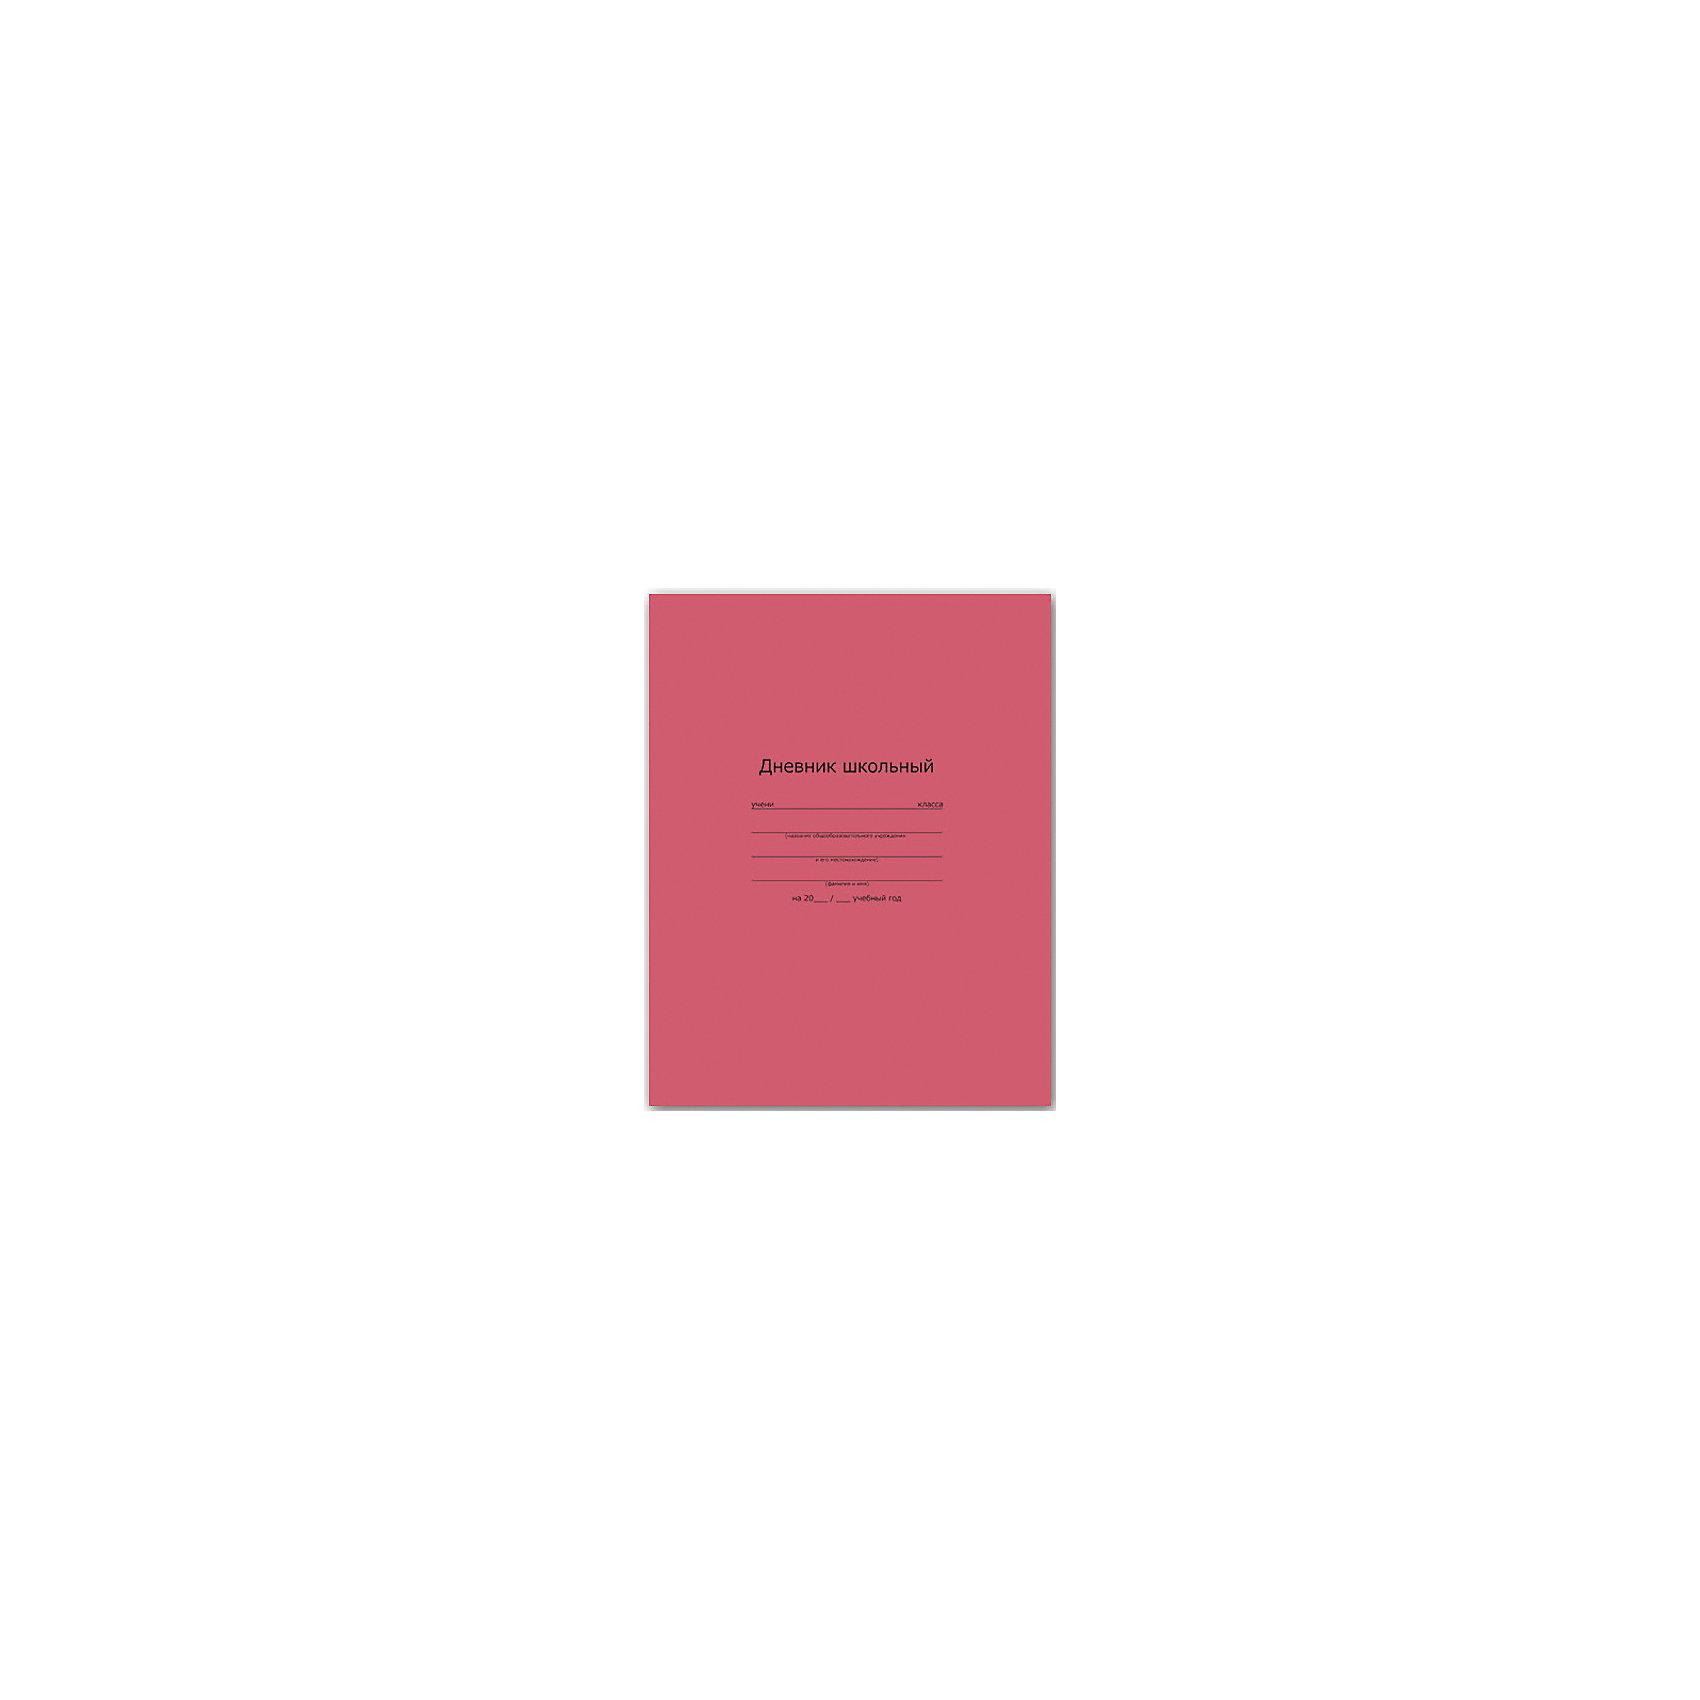 Феникс+ Дневник, розовый д васабова дневник алматинки